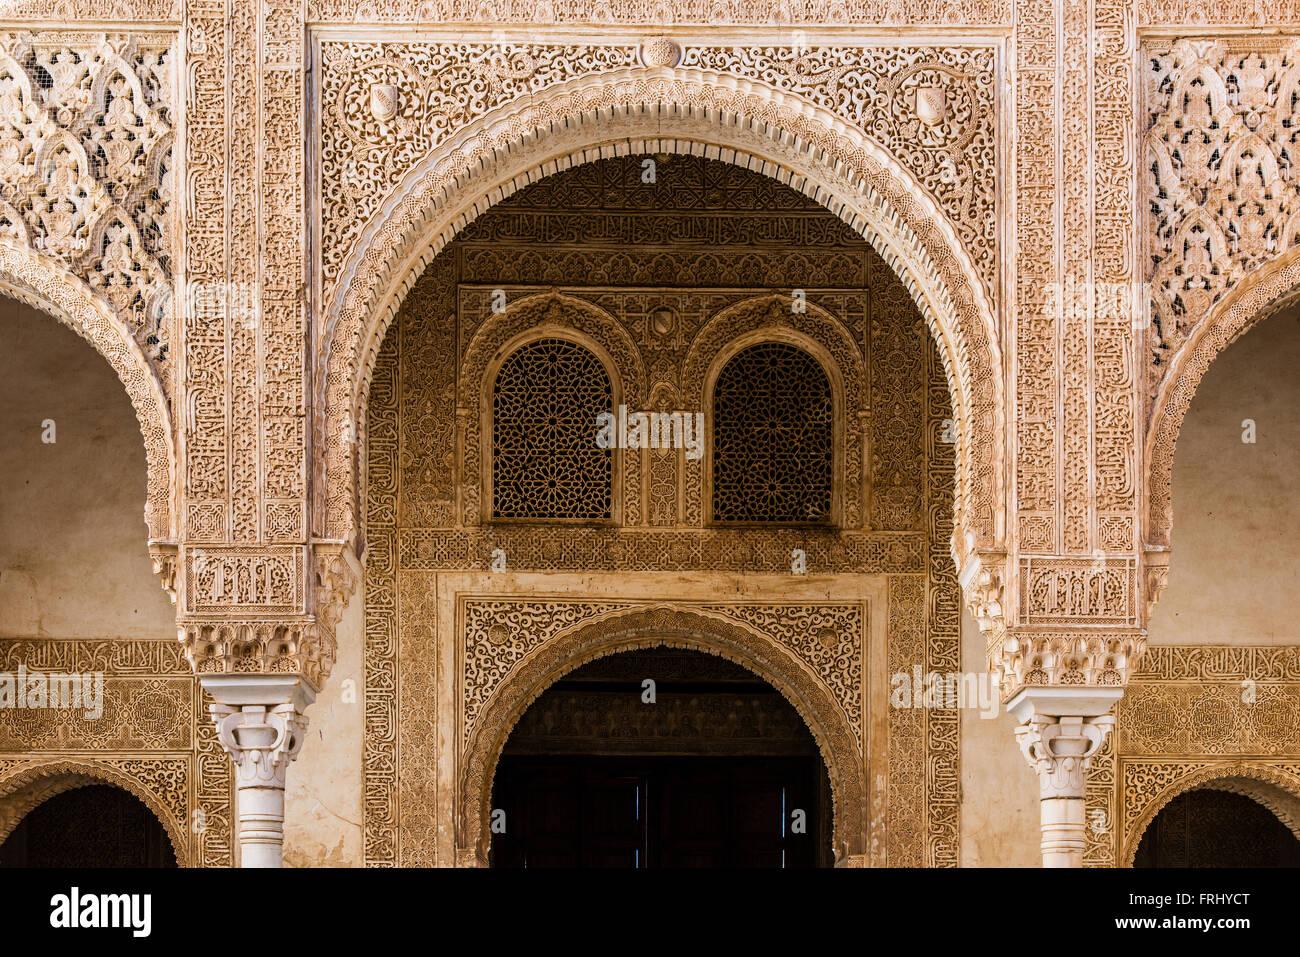 Moorish architecture inside the Palacios Nazaries or Nasrid Palaces, Alhambra palace, Granada, Andalusia, Spain - Stock Image